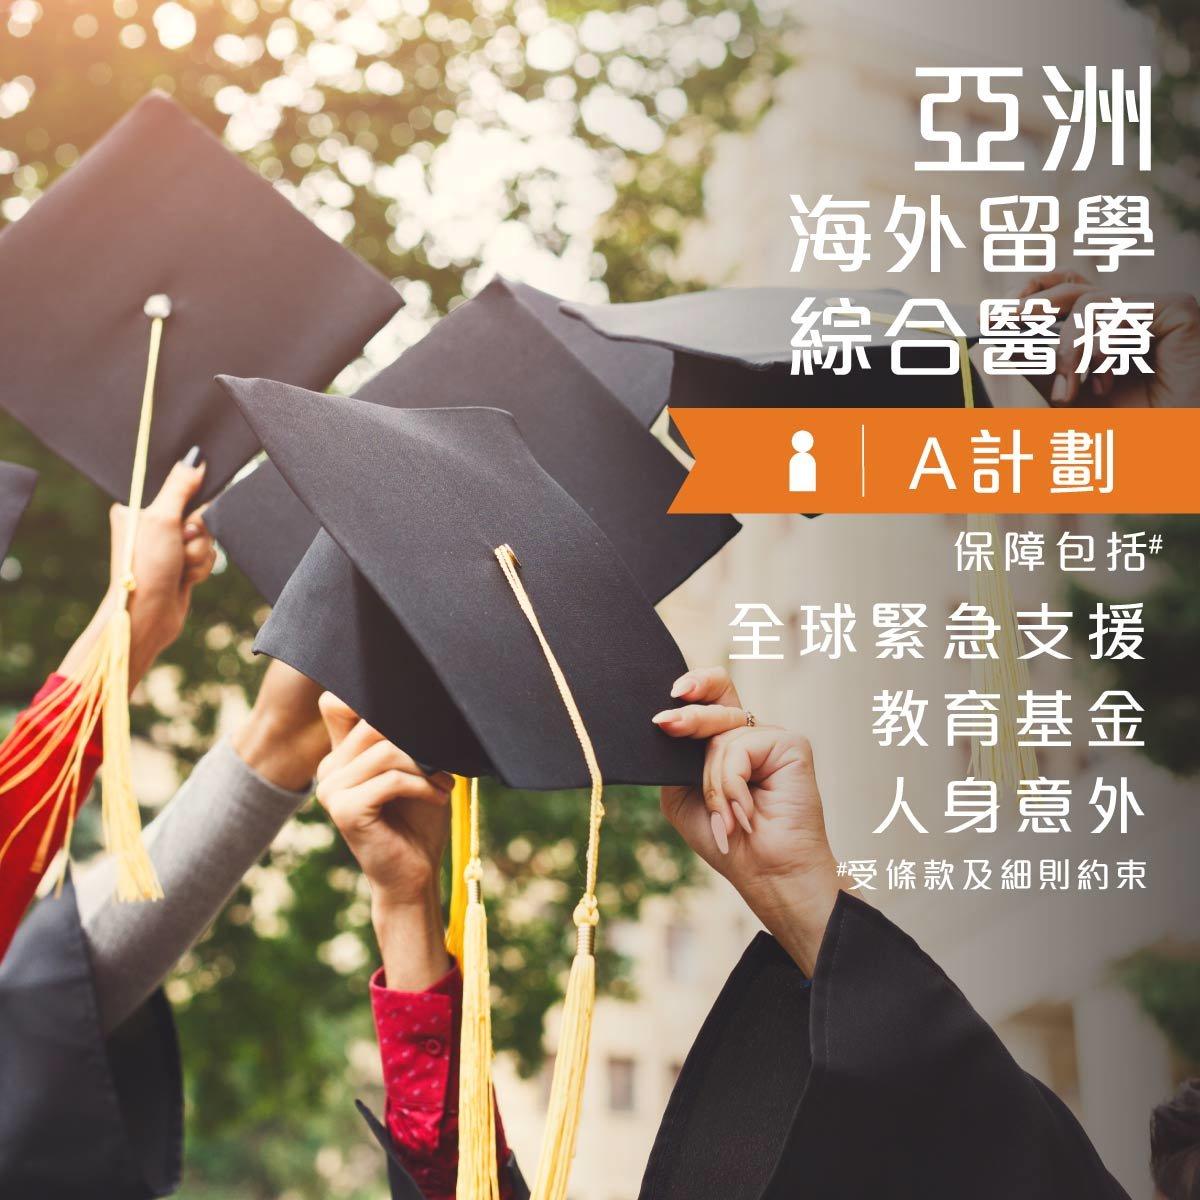 Asia – Comprehensive Medical Overseas StudyCare Insurance